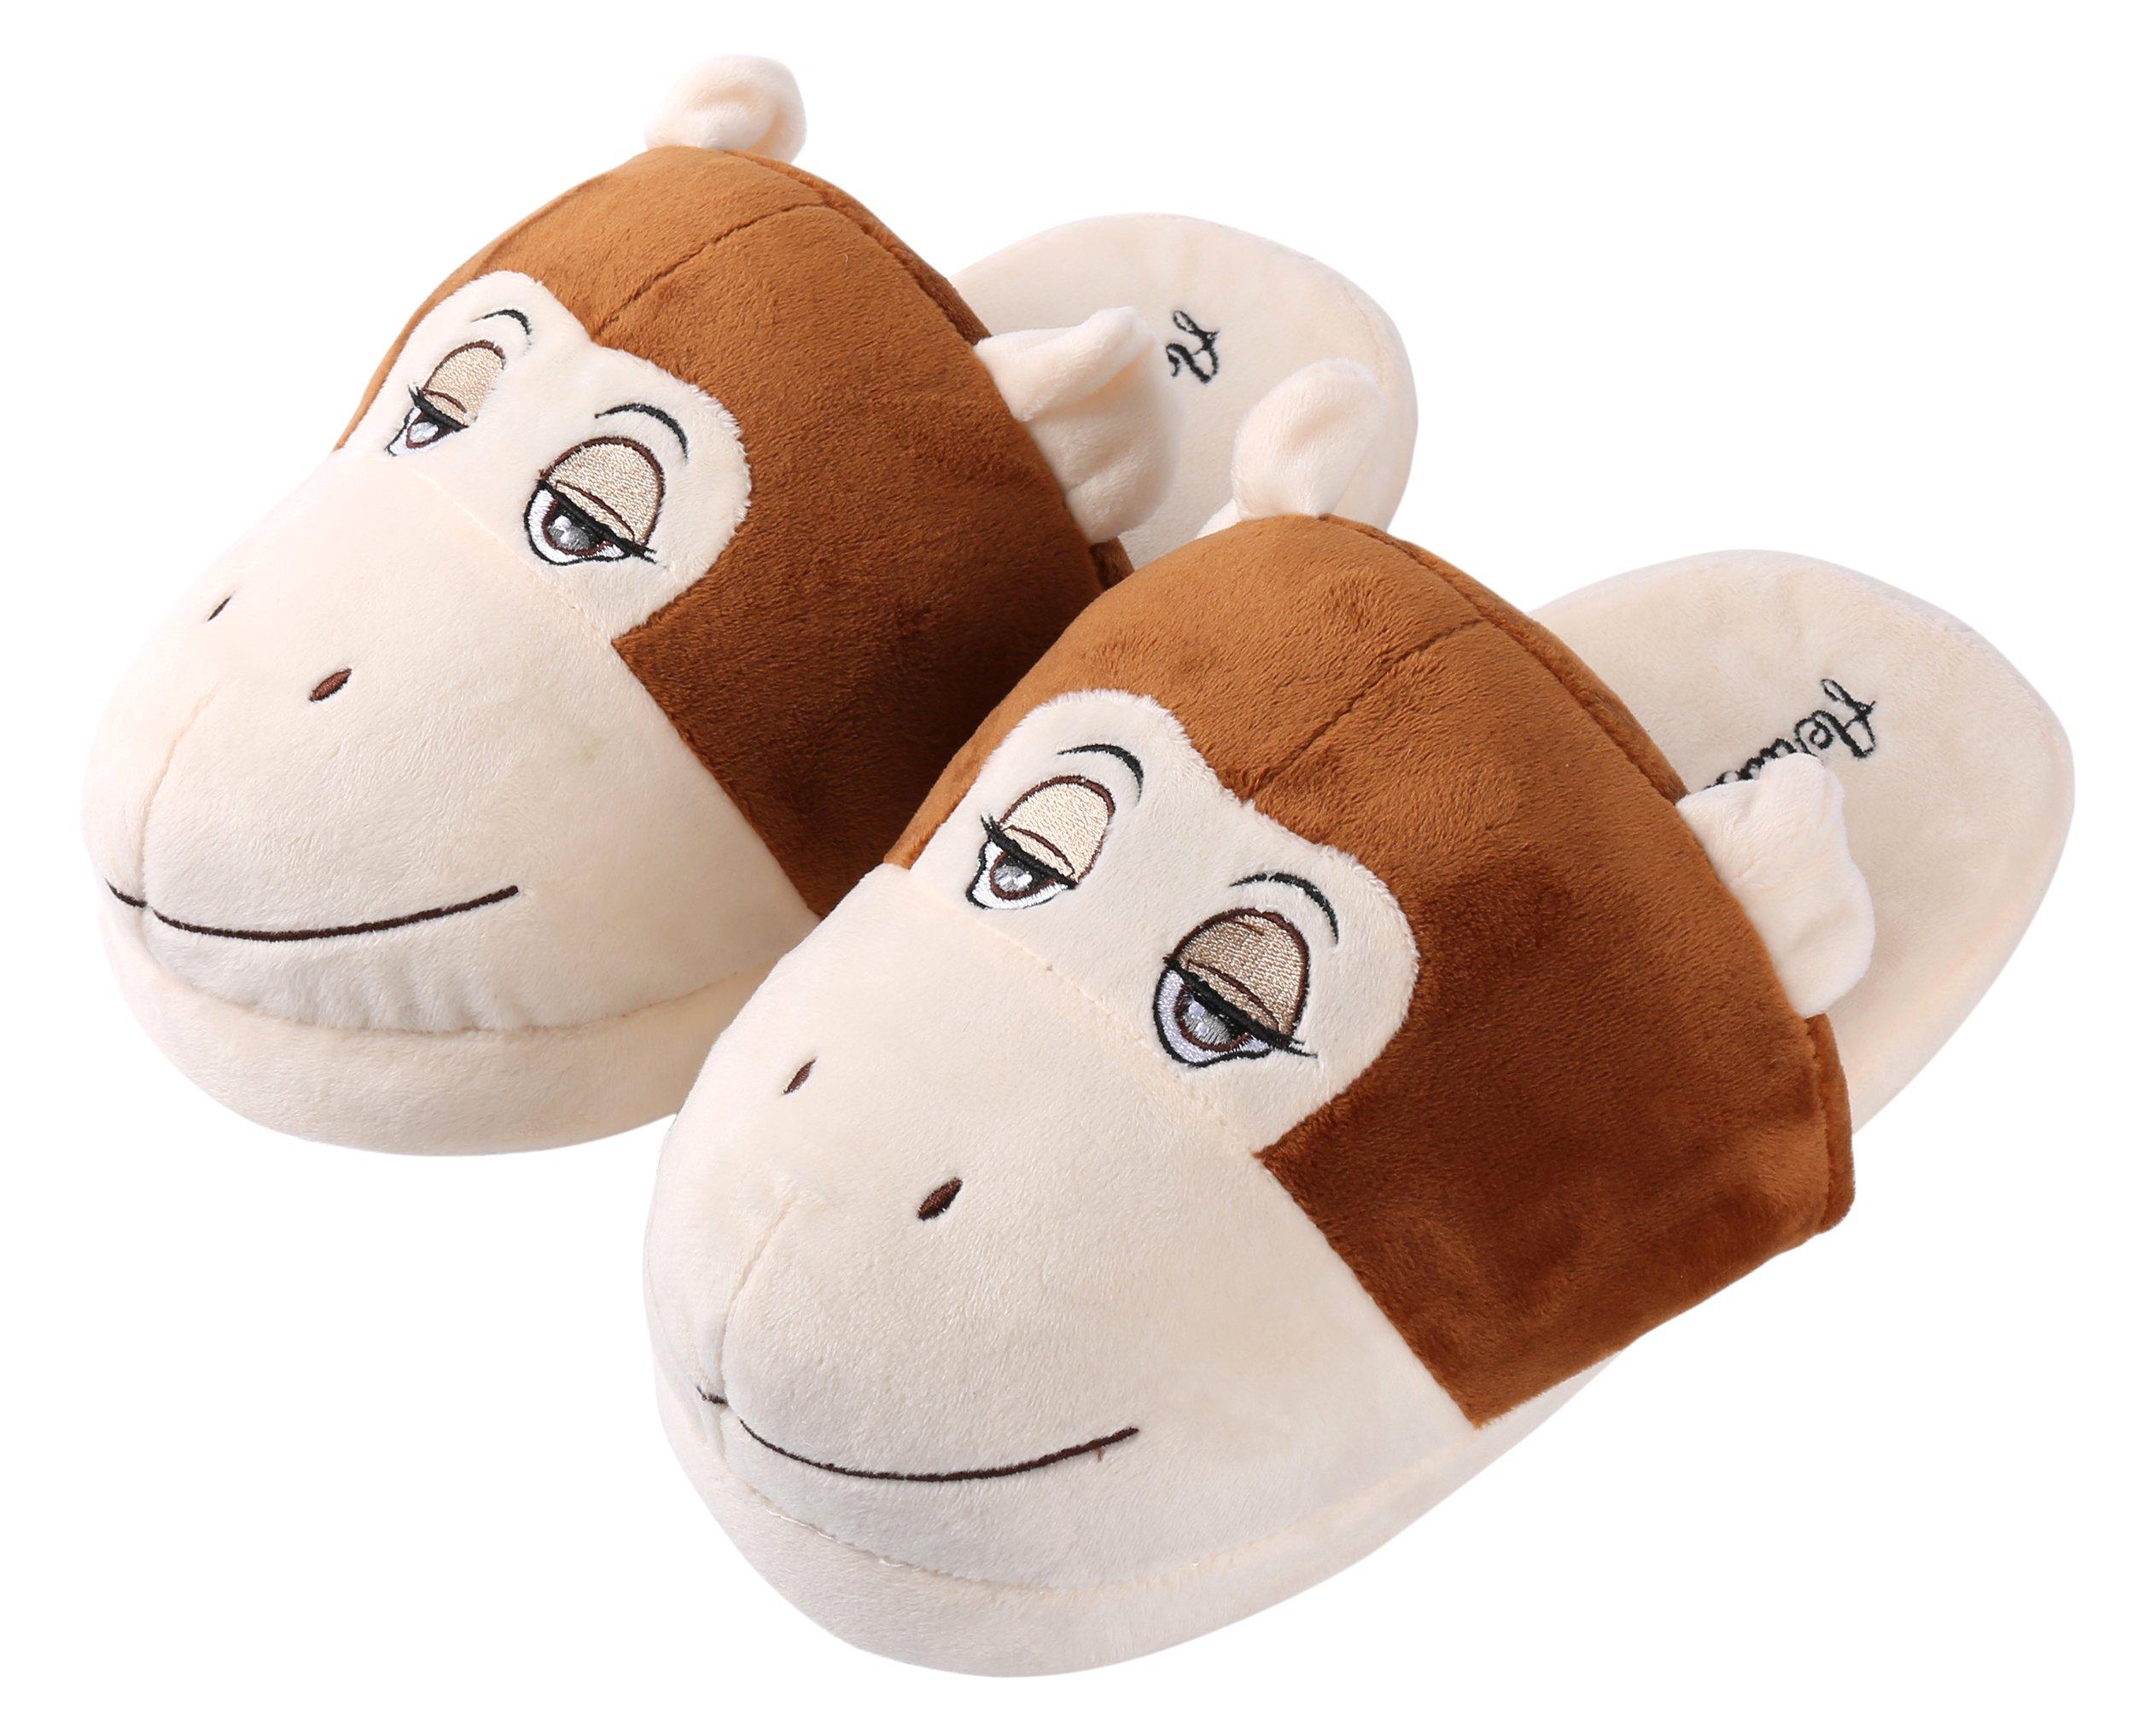 Aerusi SEC20600L Men or Women's Adult Animal Plush Slippers, Brown Monkey, 8-12''